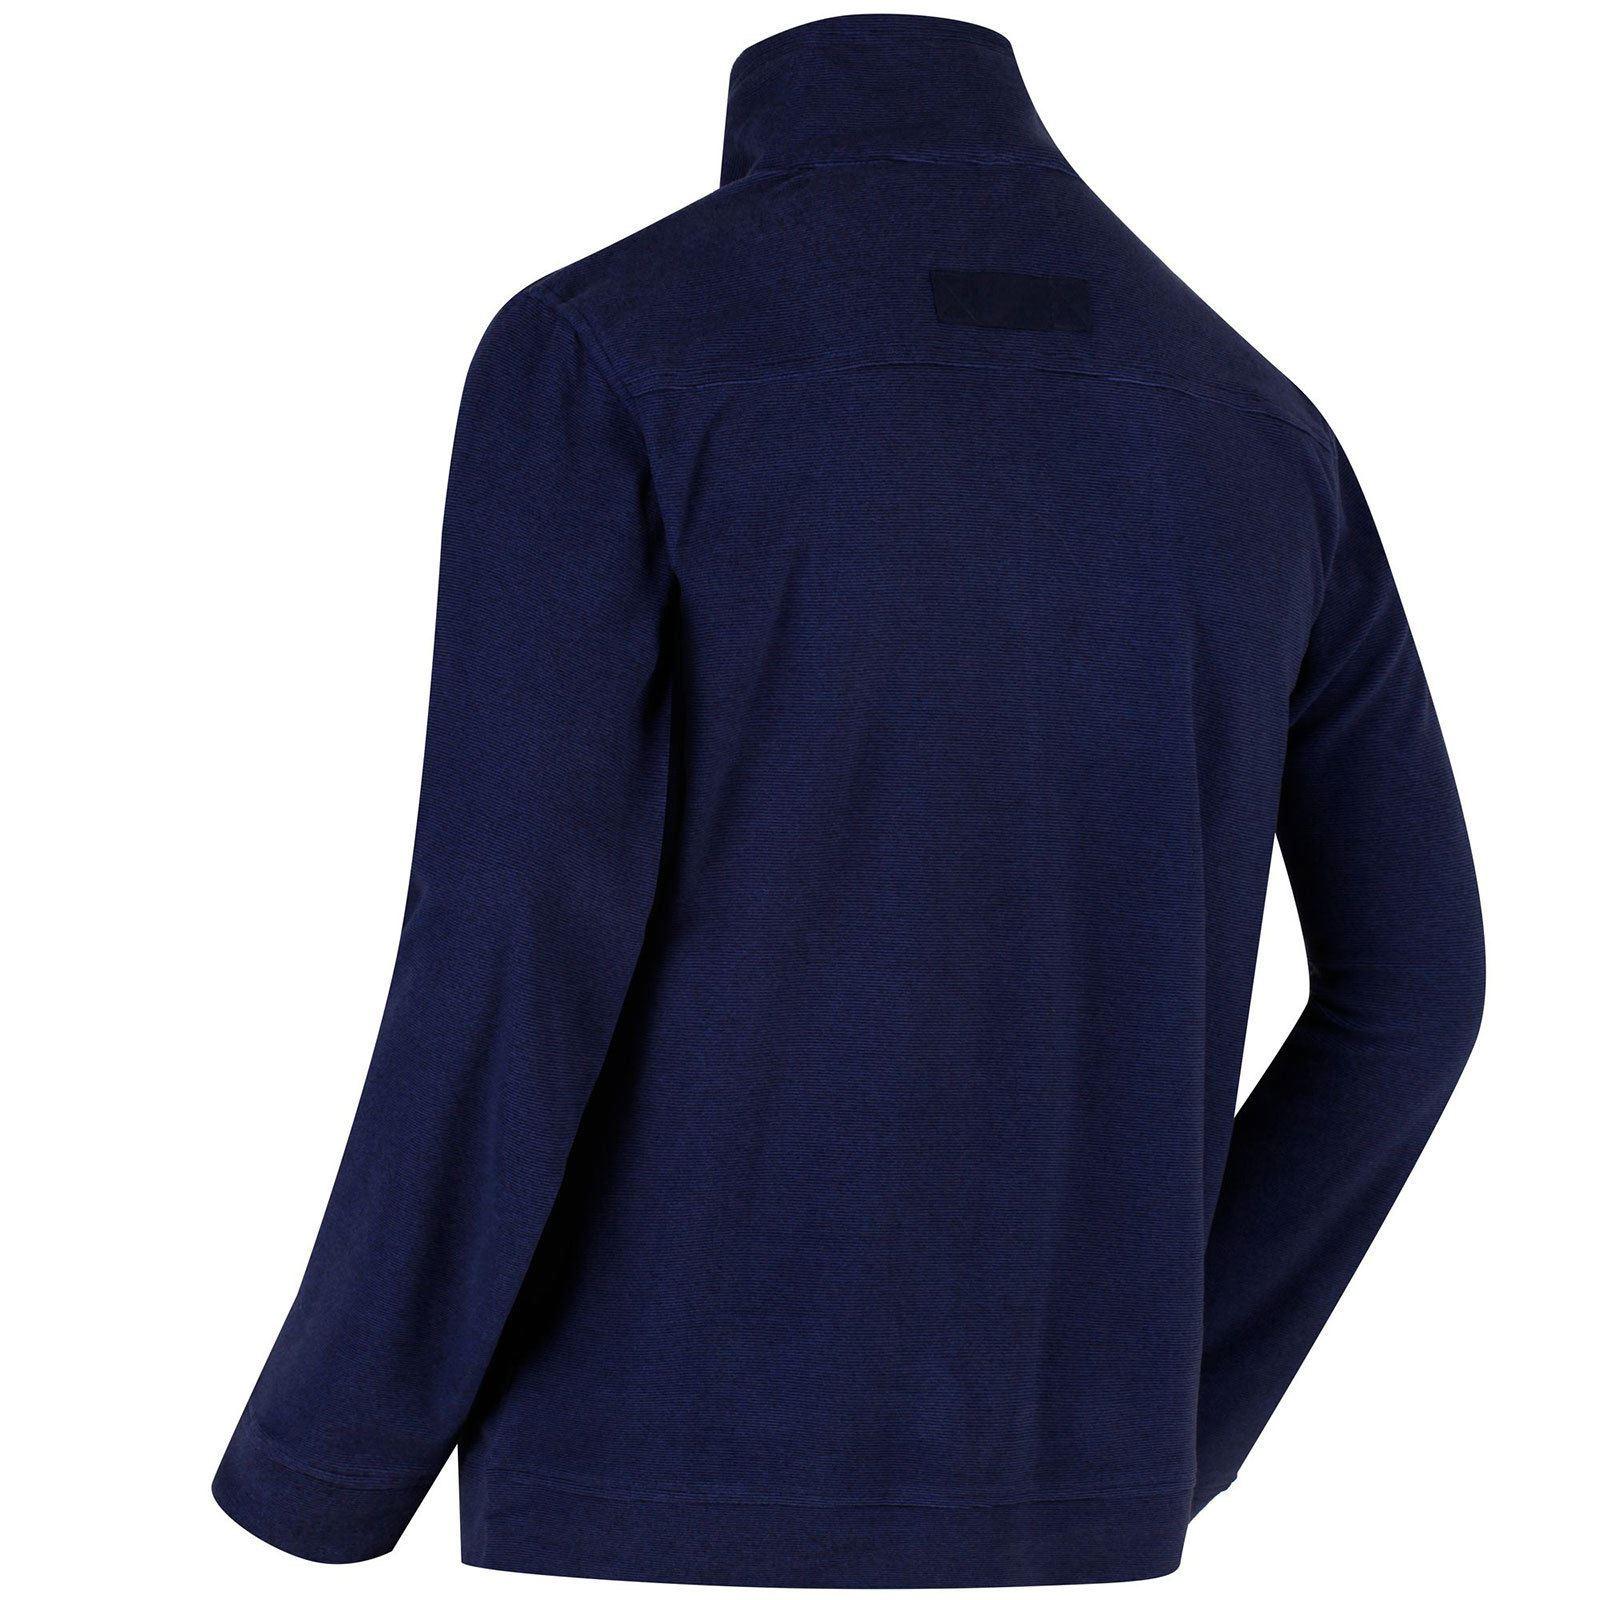 Regatta-Mens-Ultar-III-Full-Zip-Casual-Comfortable-Fleece-Jacket thumbnail 5